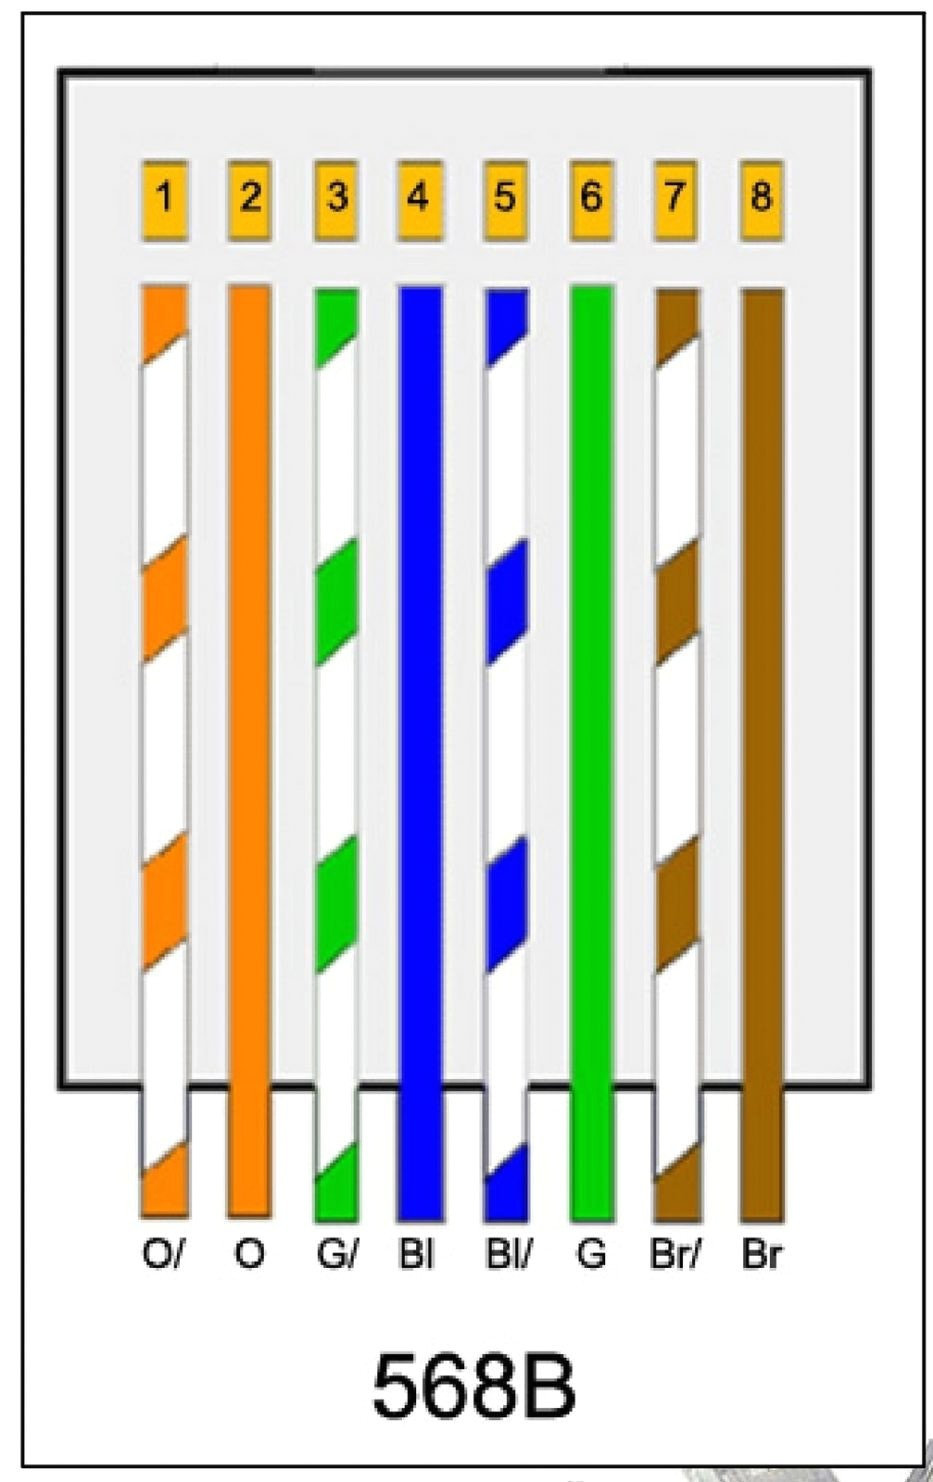 Cat5E Wiring Diagram Pdf | Wiring Diagram - Cat 5E Wiring Diagram